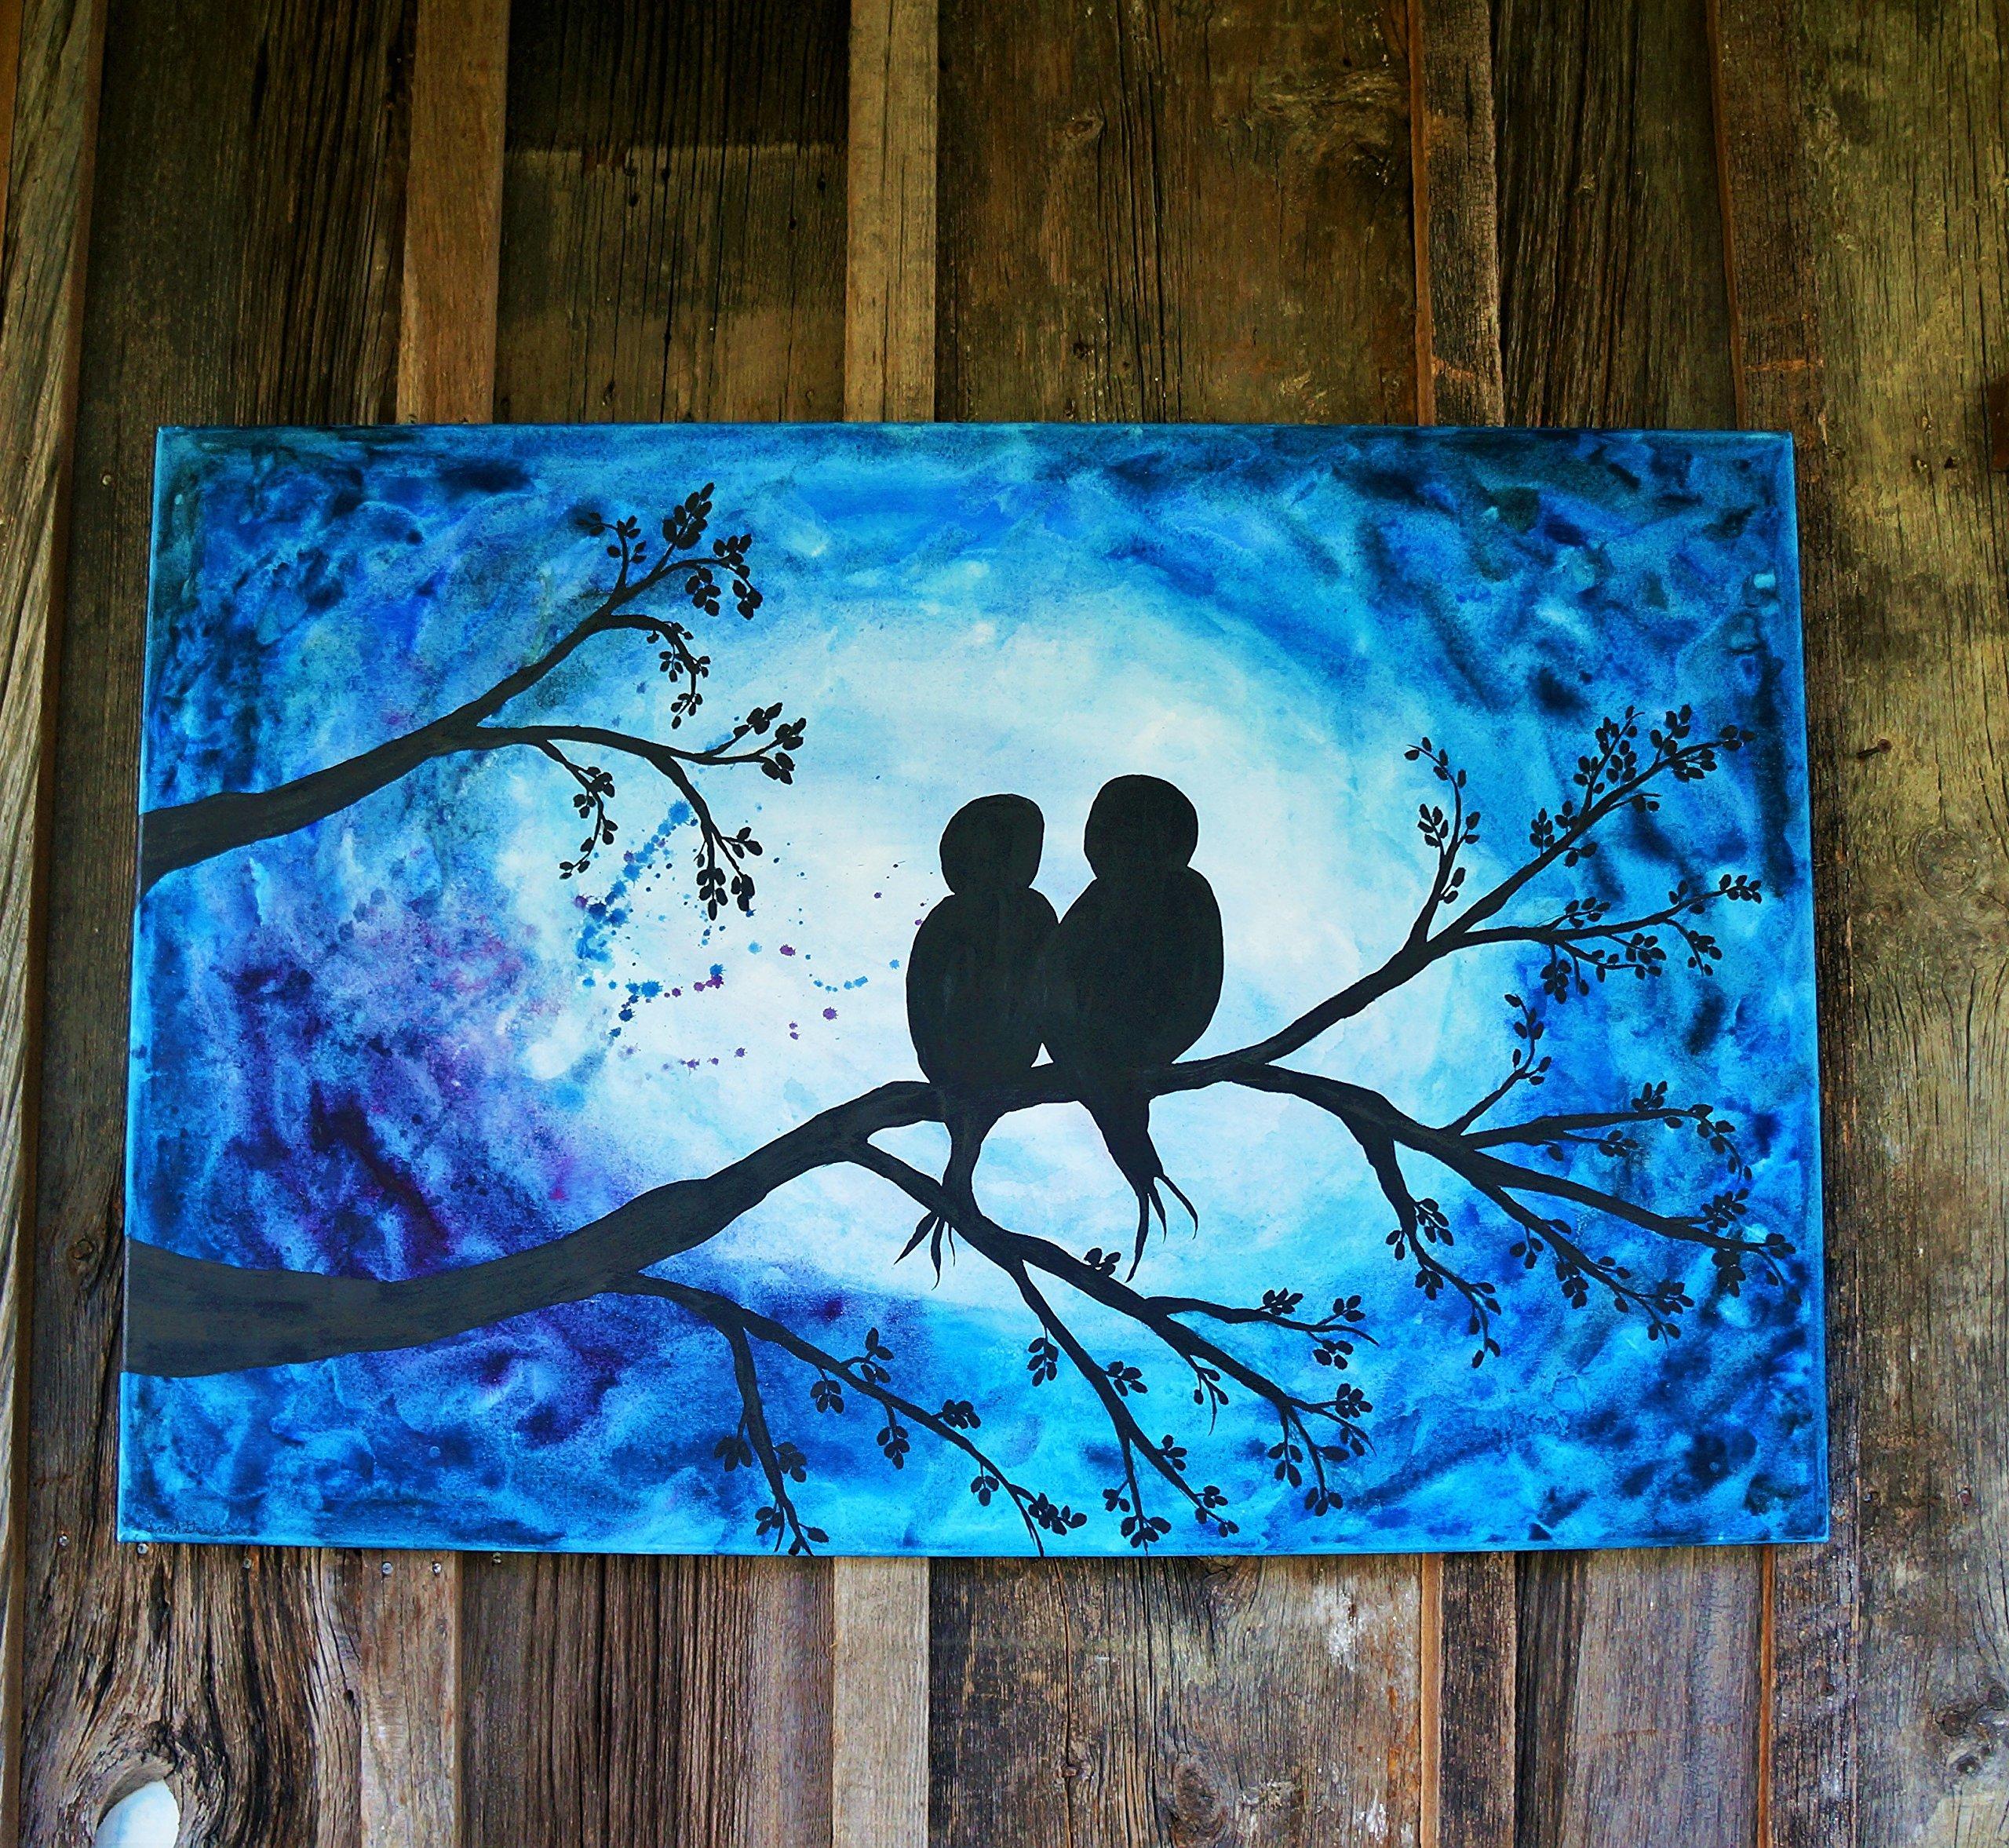 Lovebird painting, Blue bird painting, Original art, Watercolor painting, Wedding gift, Anniversary gift, Large wall art, Midnight painting